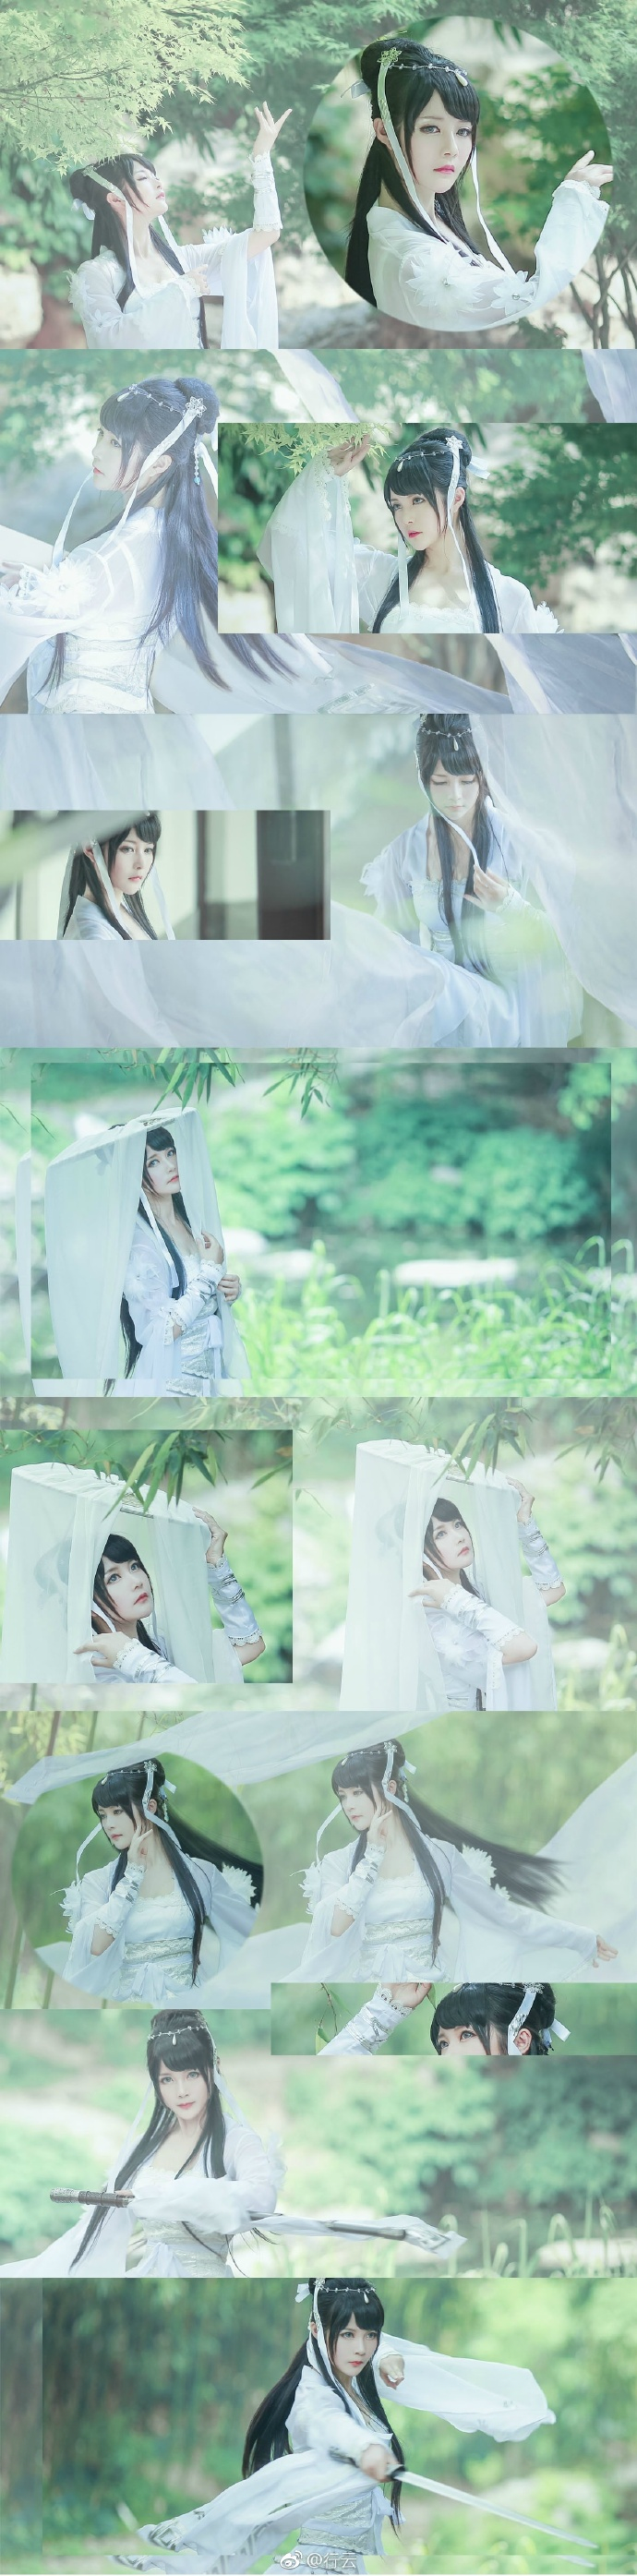 【cos正片】天涯明月刀OL---素问·太白-cos欣赏 cn:行云 cosplay-第4张